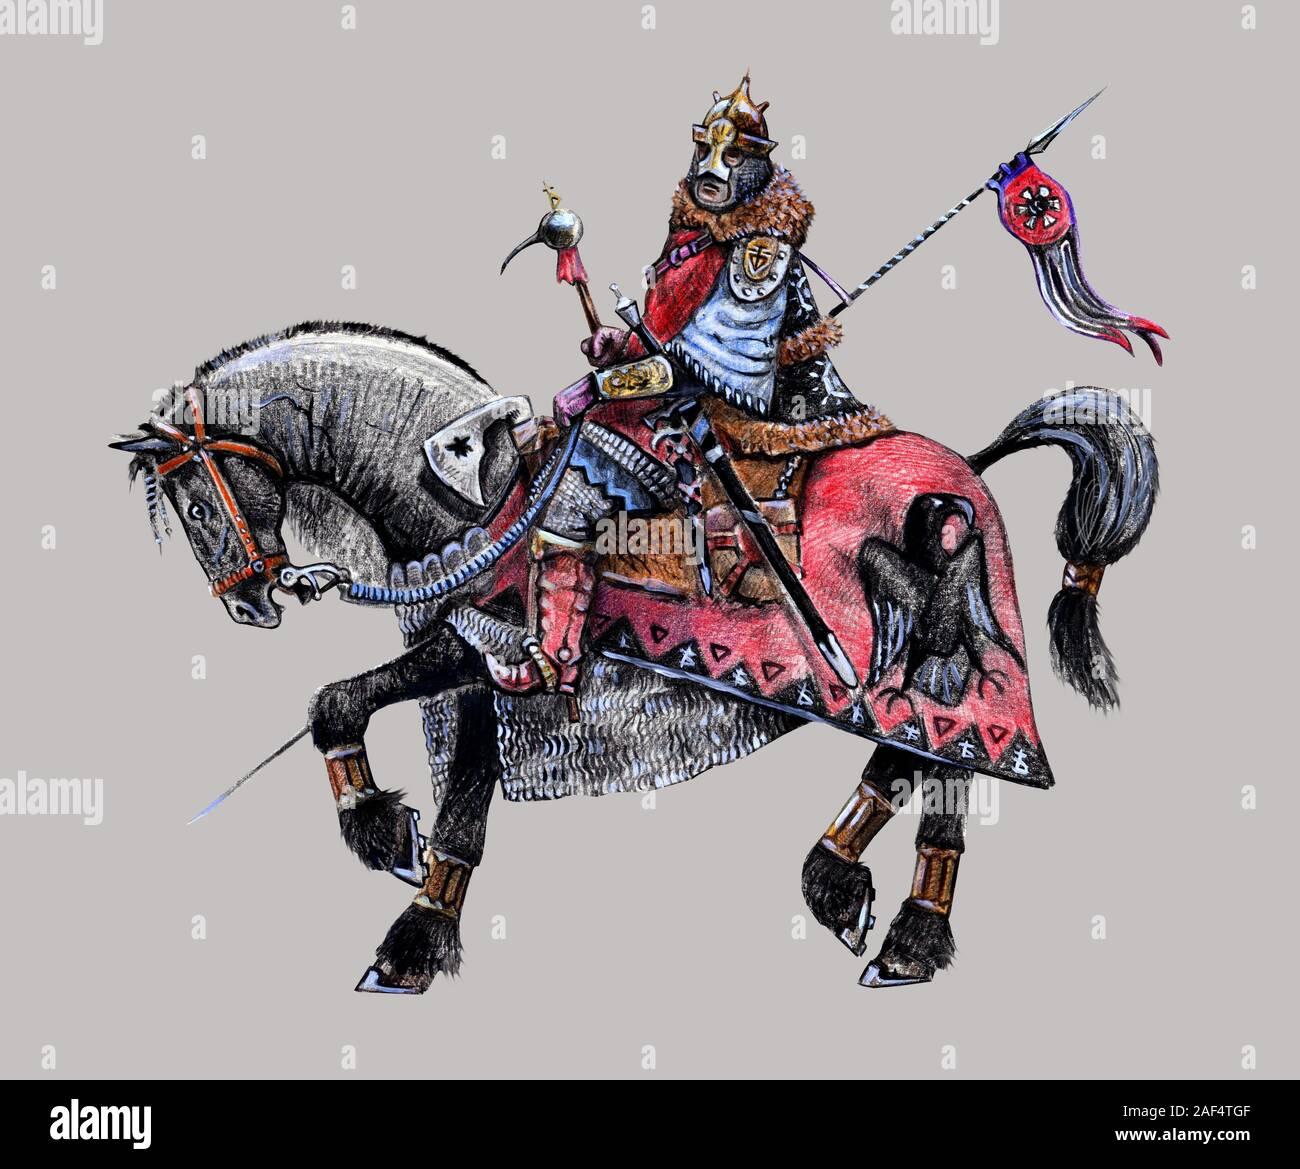 Mounted Fantasy Knight Illustration Barbarian Rider On The Black Horse Stock Photo Alamy